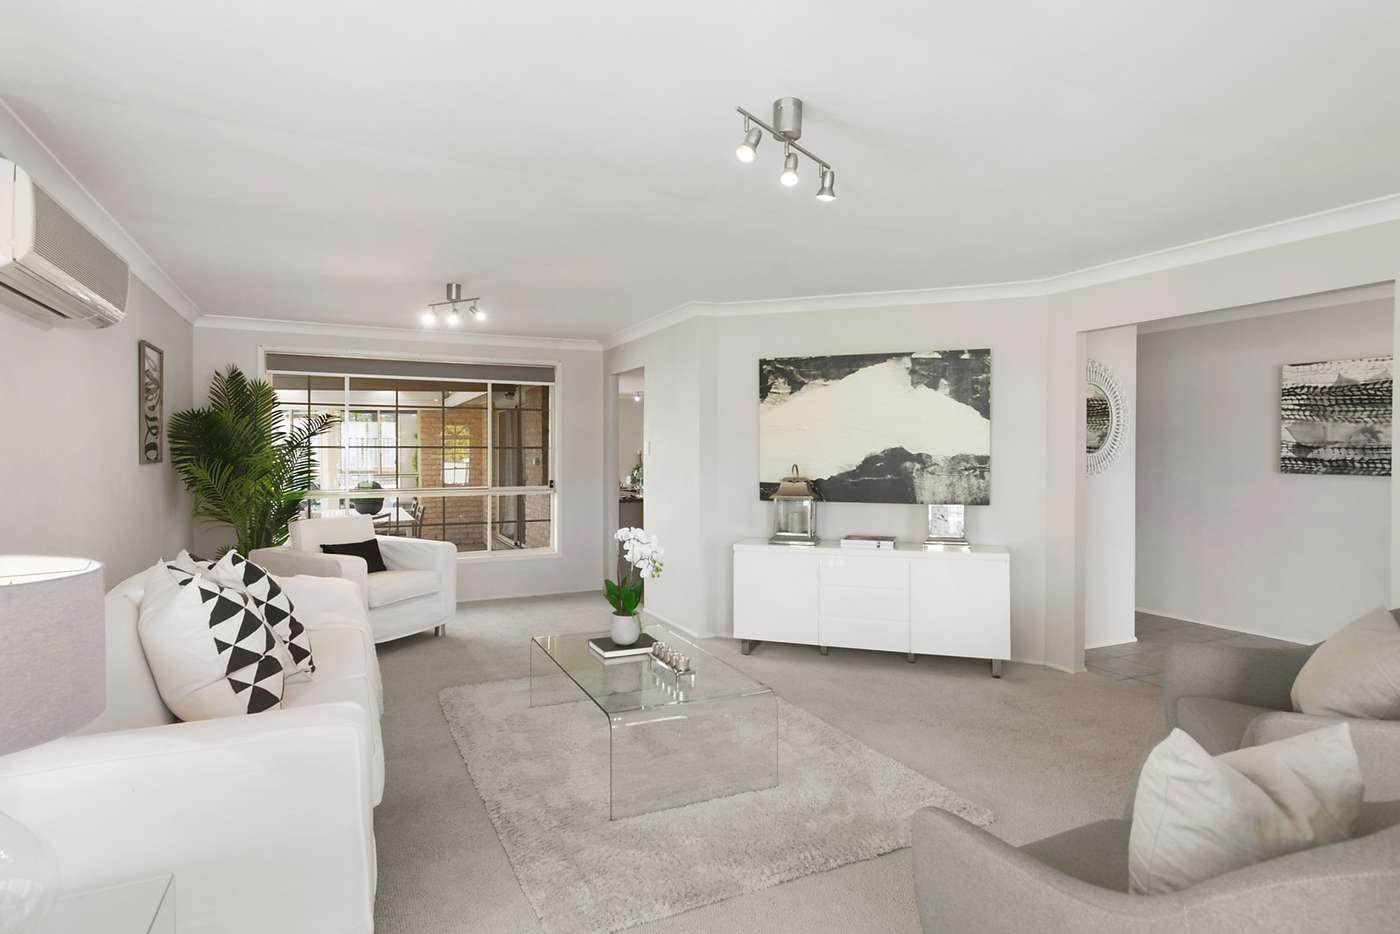 Sixth view of Homely house listing, 17 Ulana Avenue, Halekulani NSW 2262